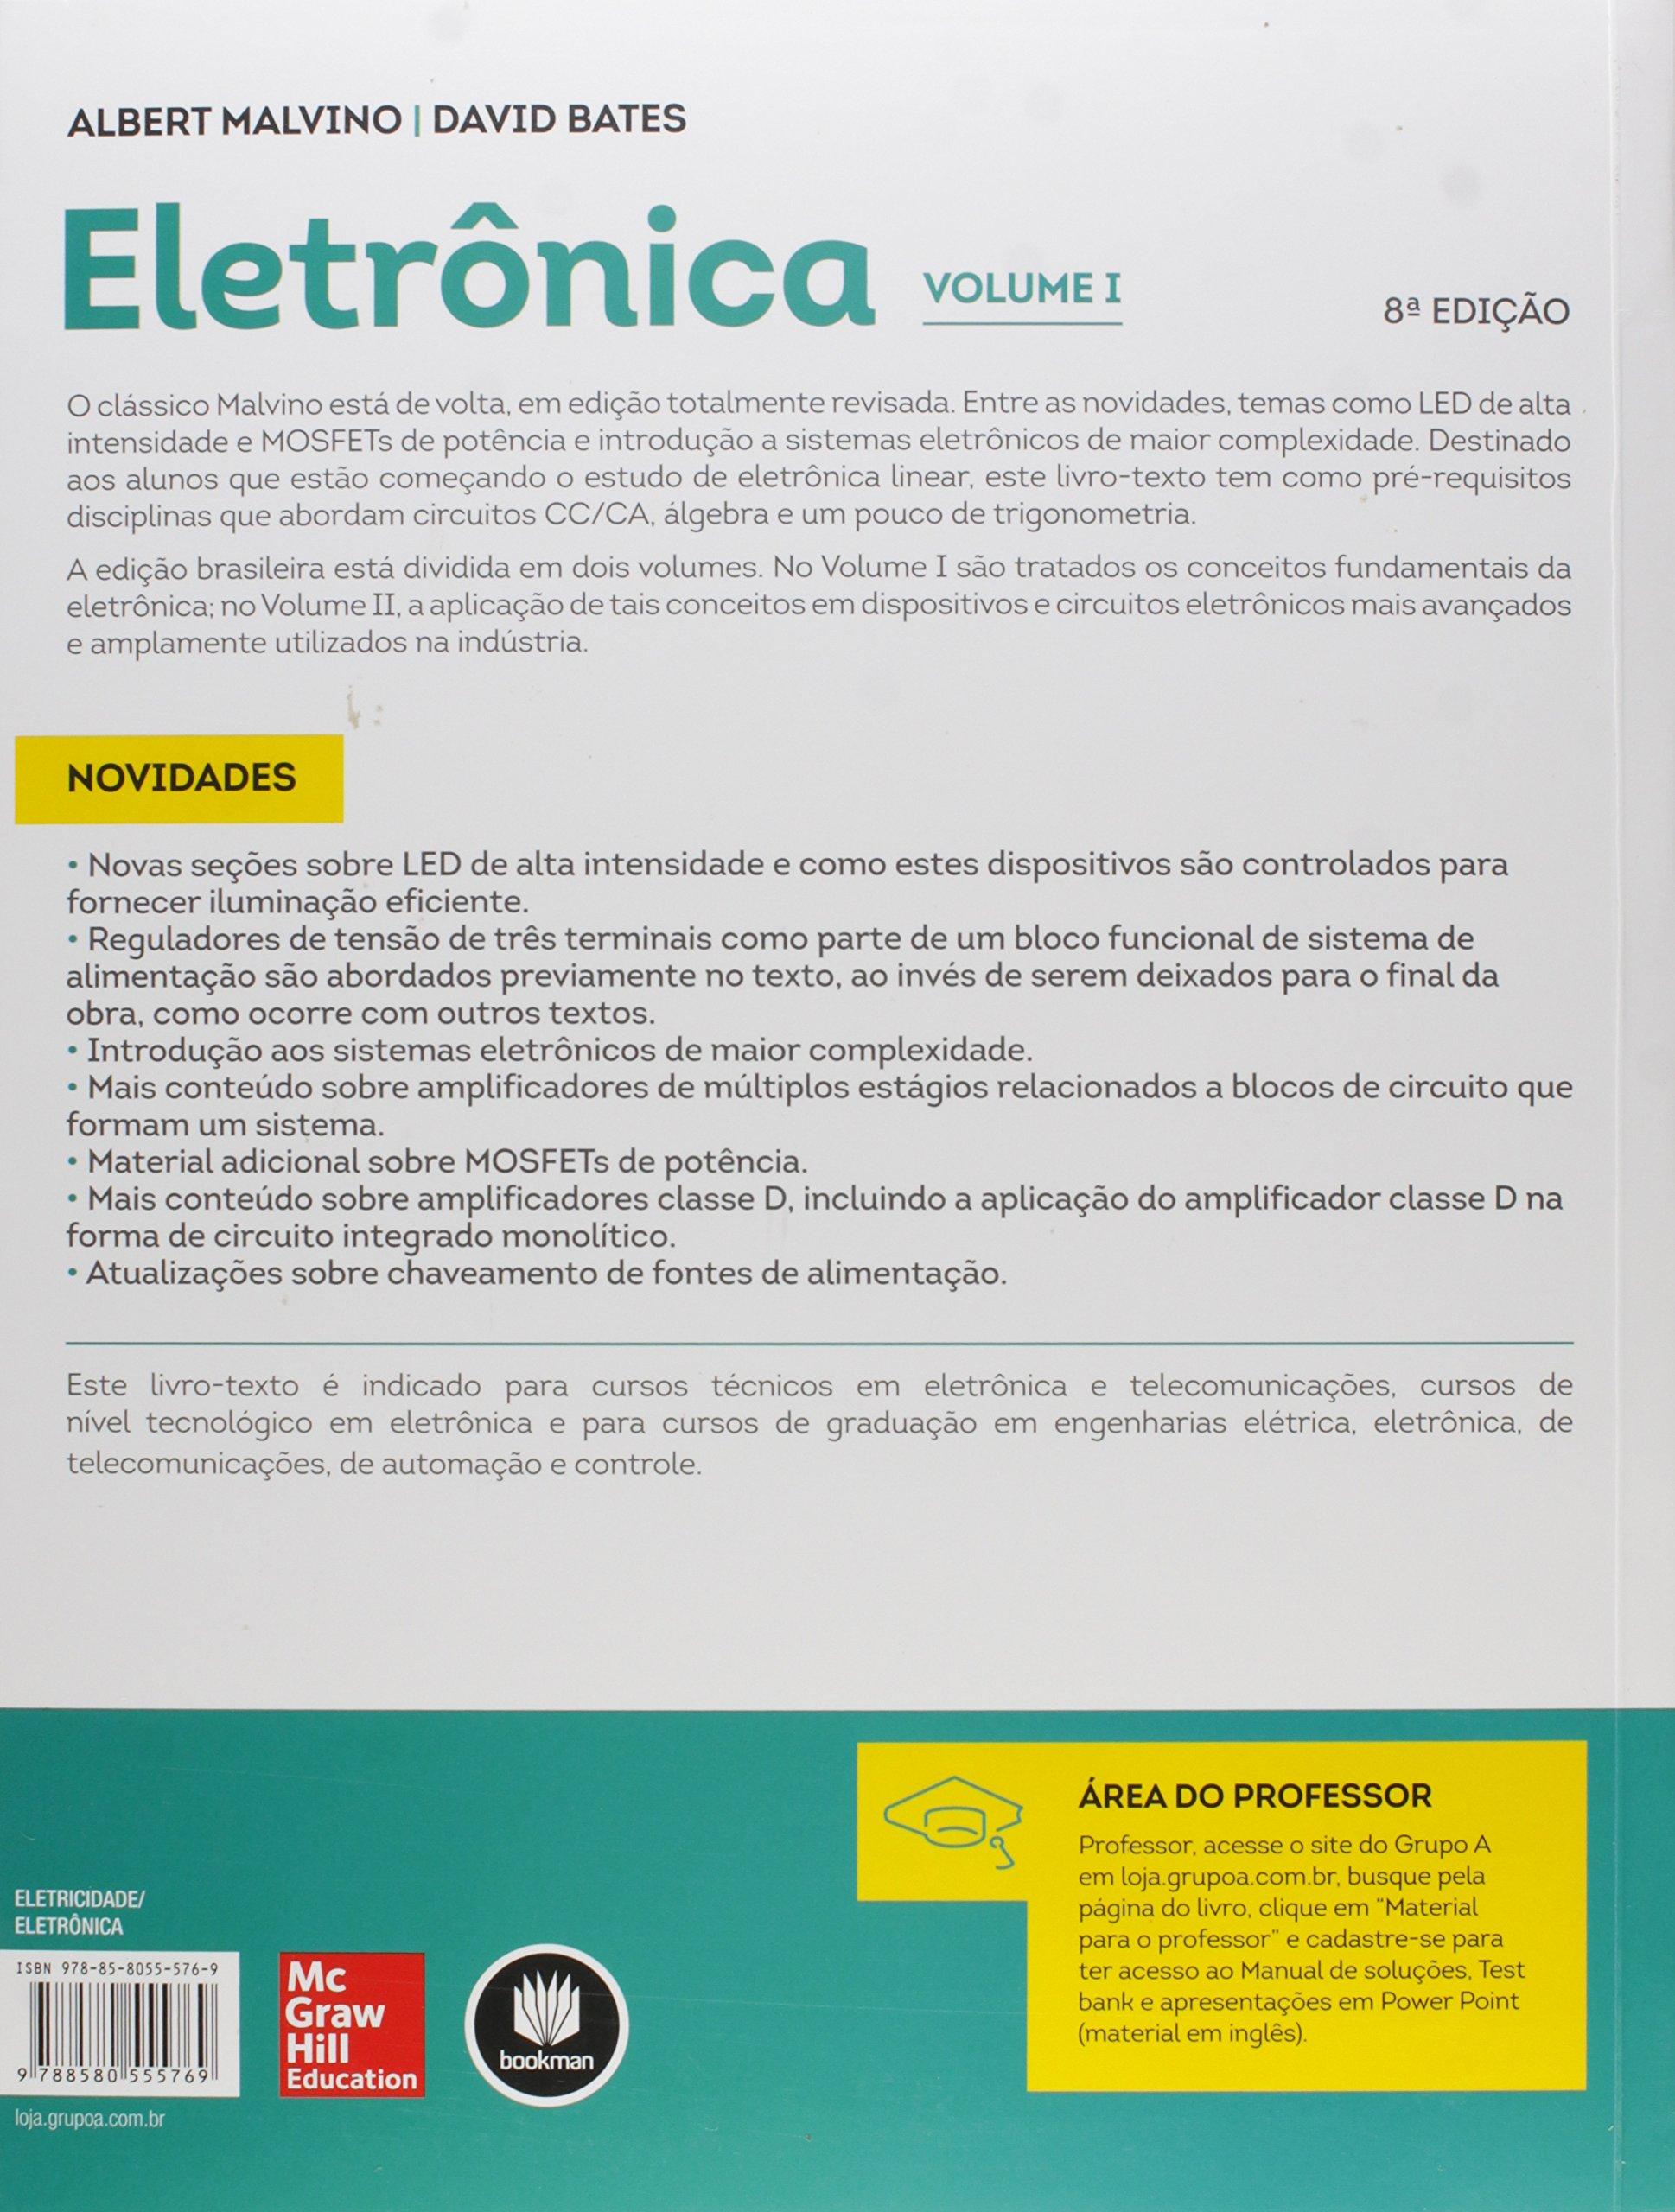 ELETRONICA 1 BAIXAR VOL MALVINO